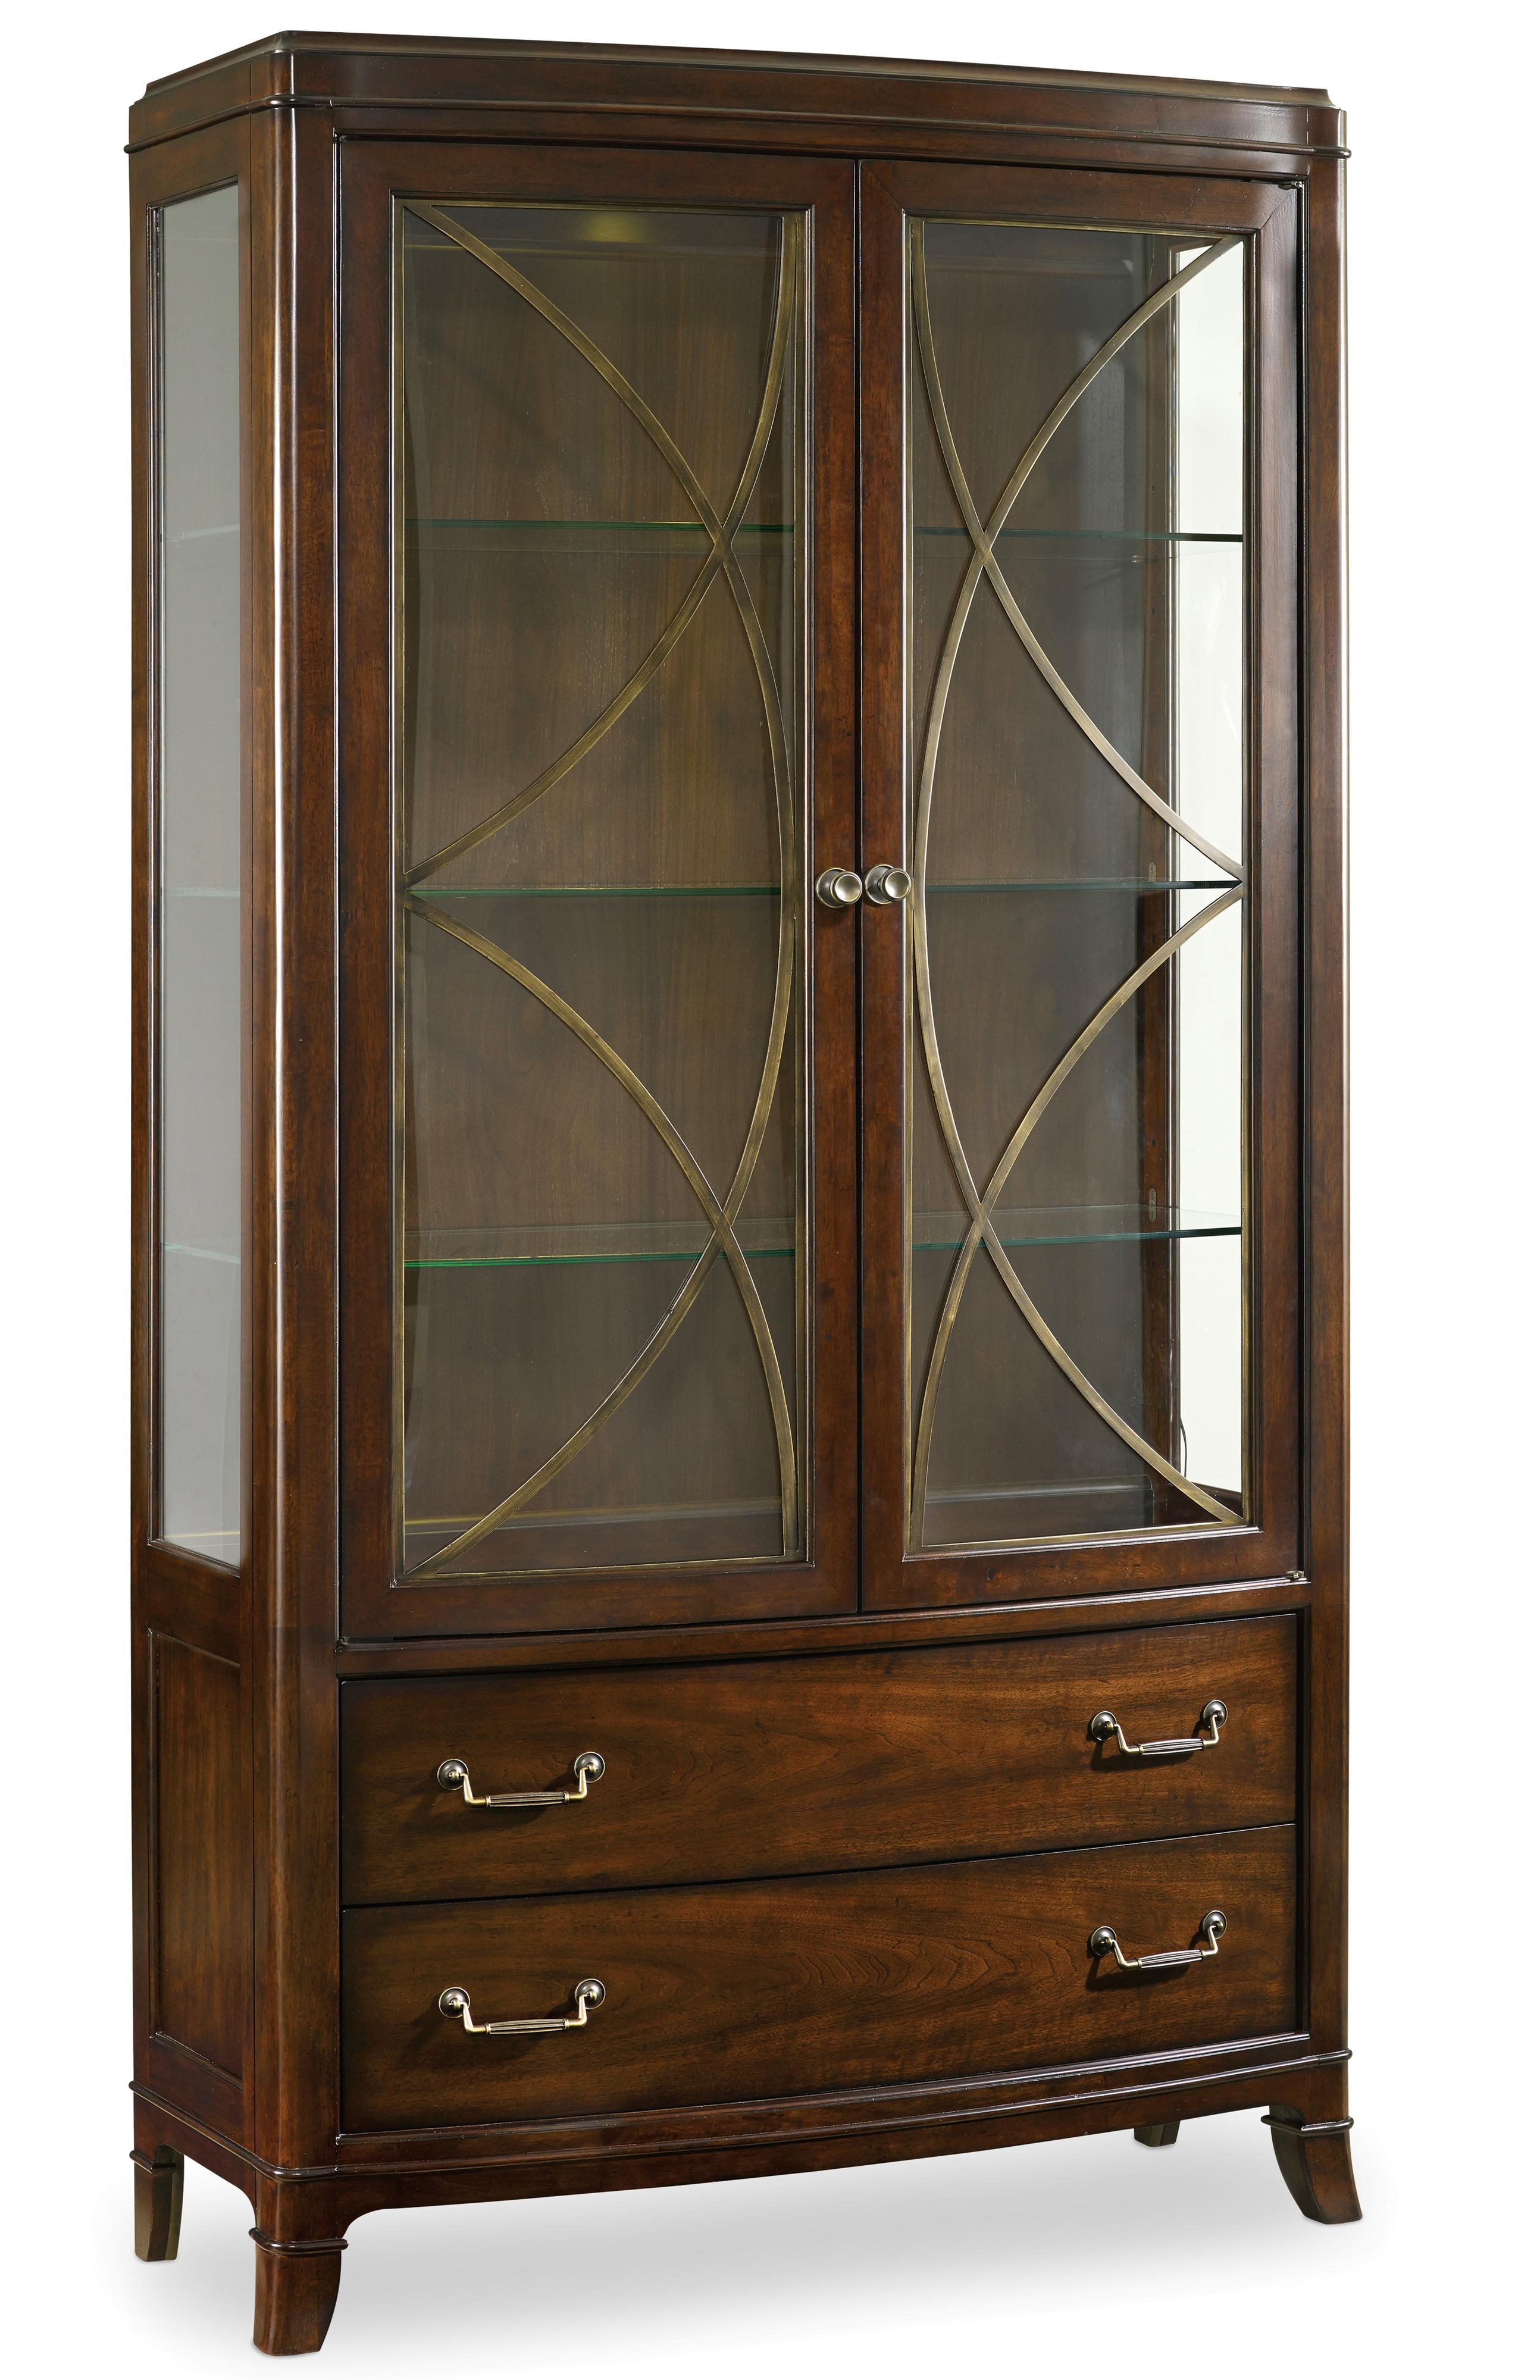 Palisade Display China by Hooker Furniture at Upper Room Home Furnishings